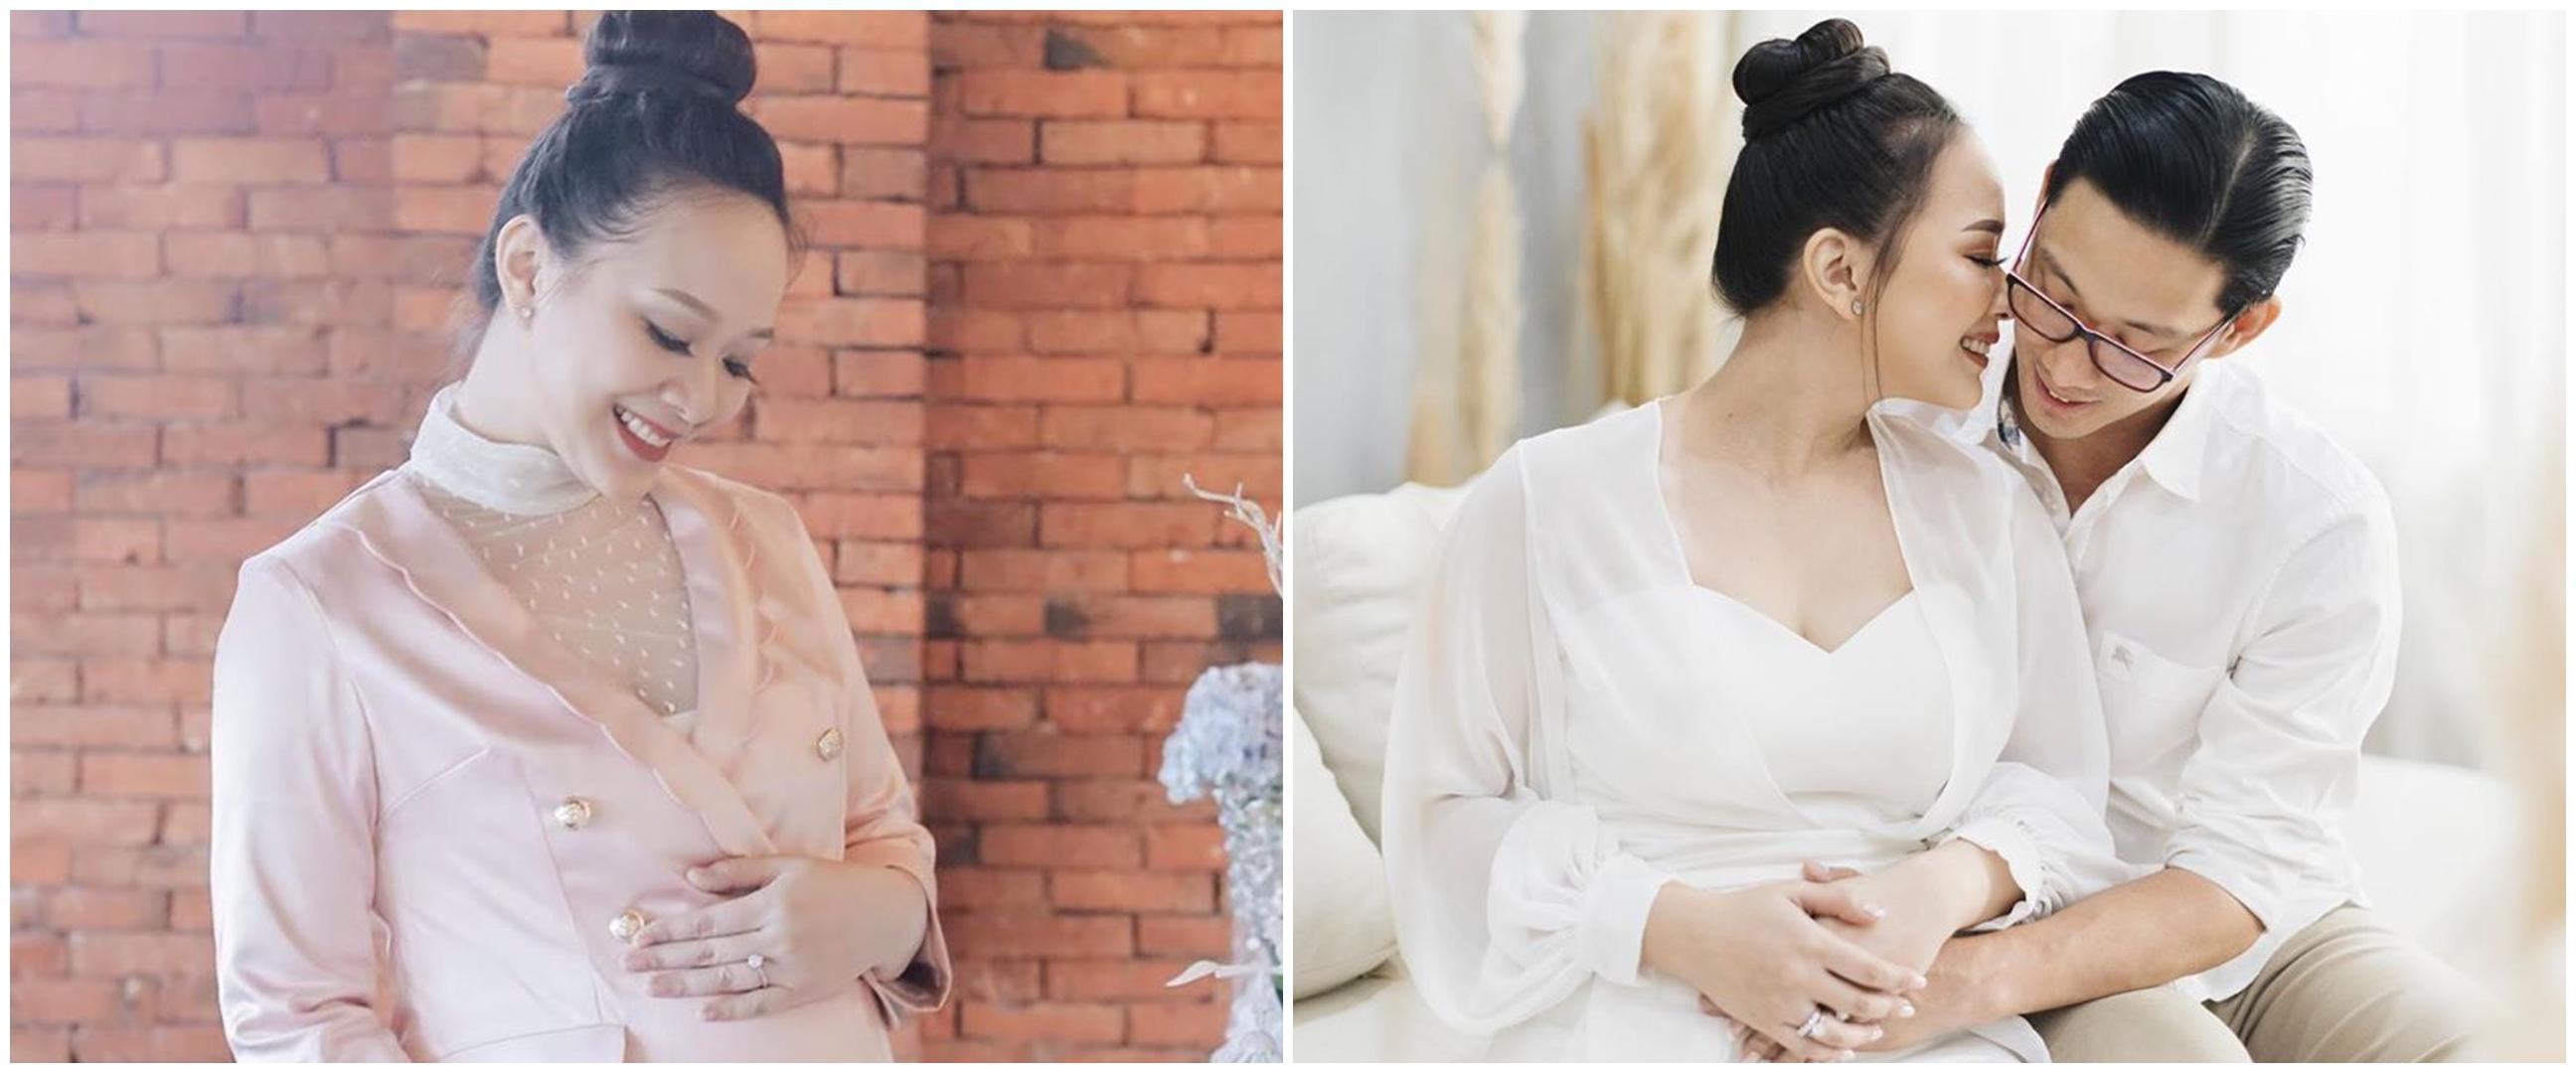 Yuanita Christiani melahirkan, paras sang bayi bikin penasaran